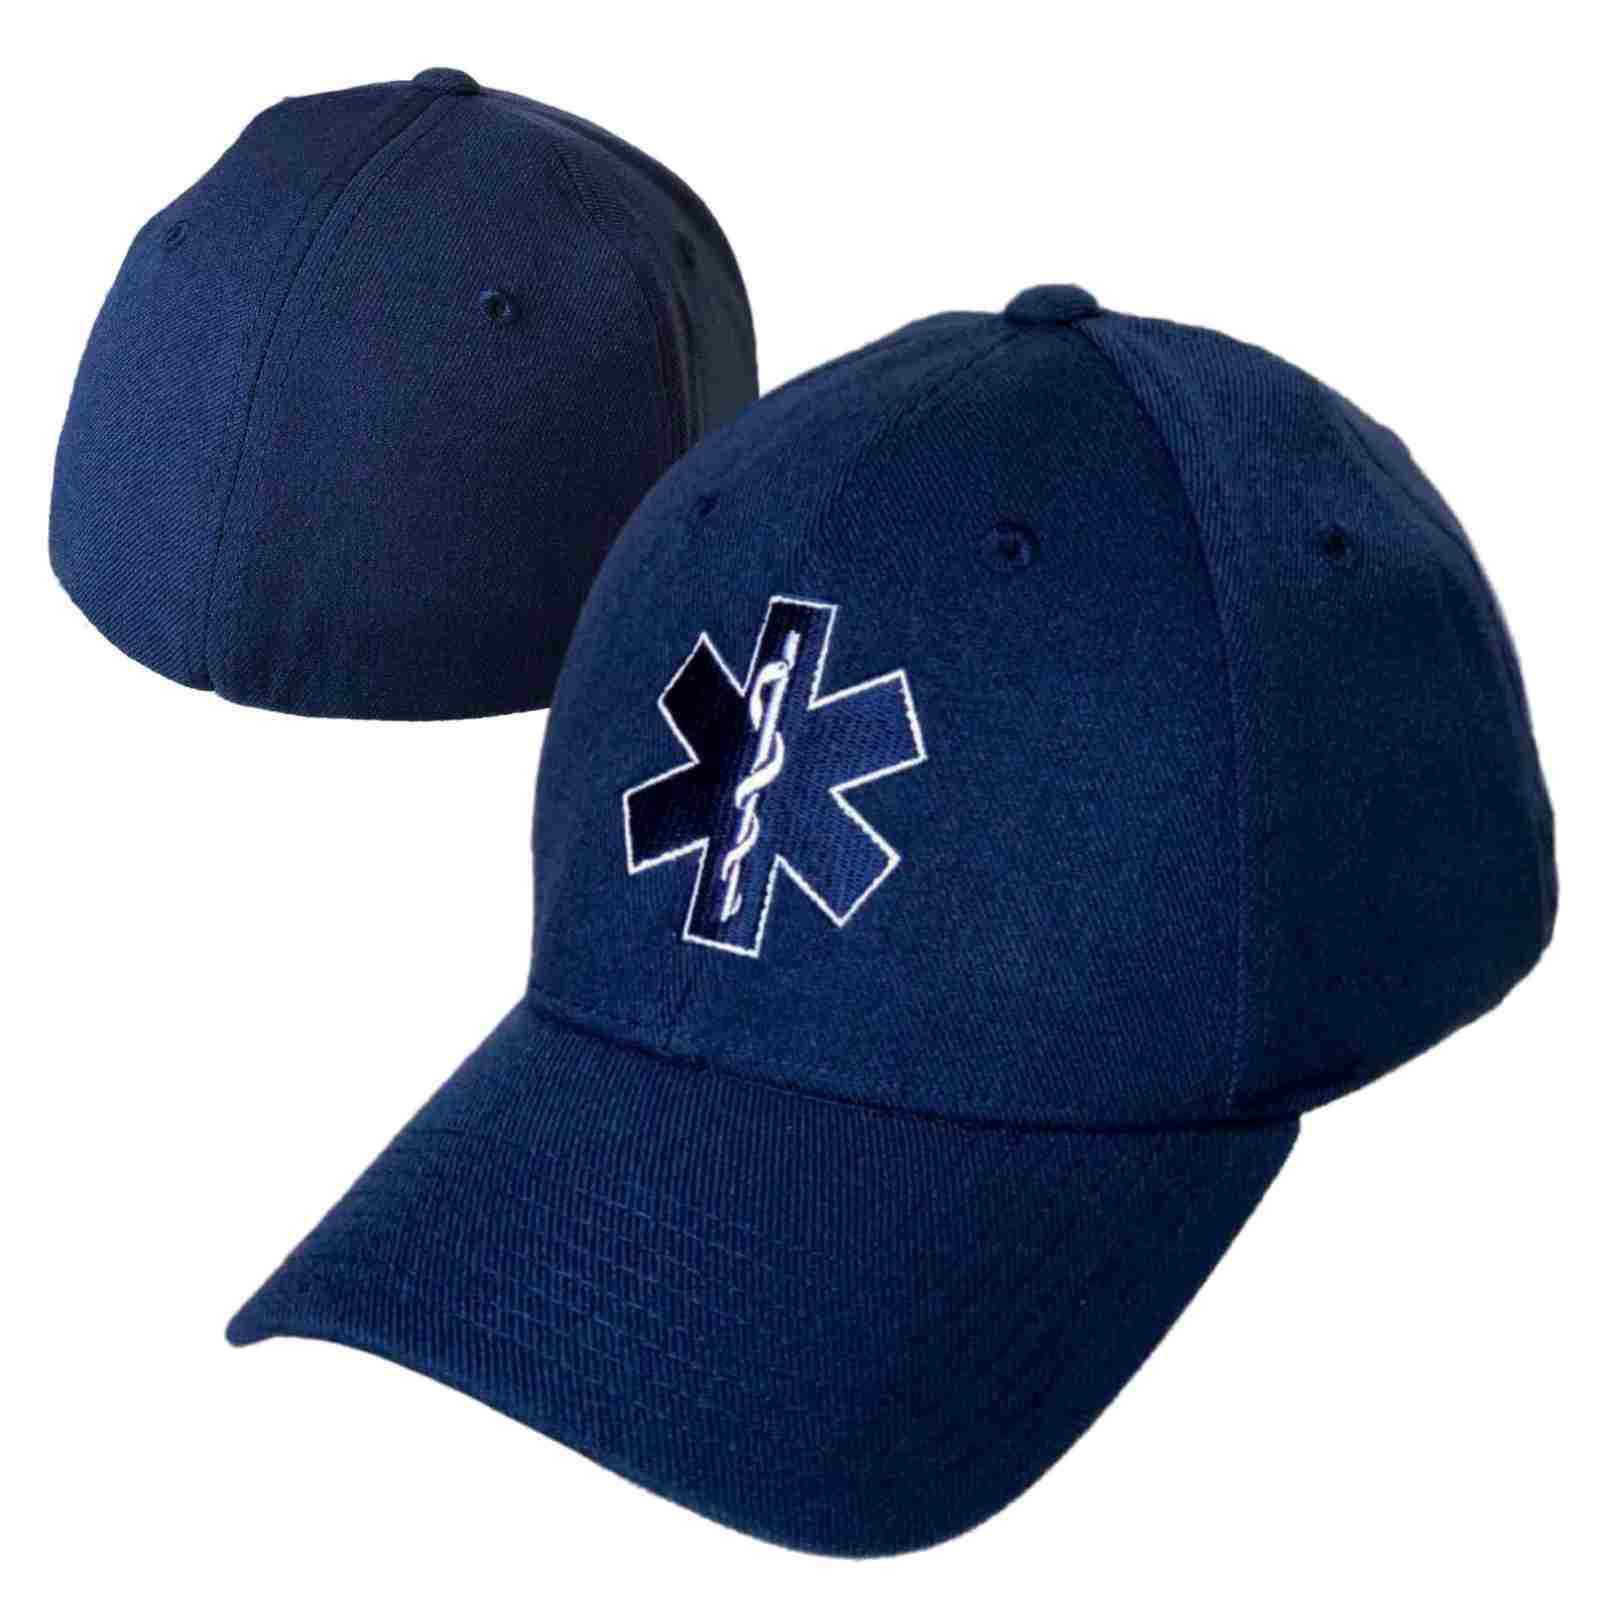 fc969610b32 Details about Emergency Medical Technician EMT Cross EMS Paramedic Flex Baseball  Cap Hat L XL